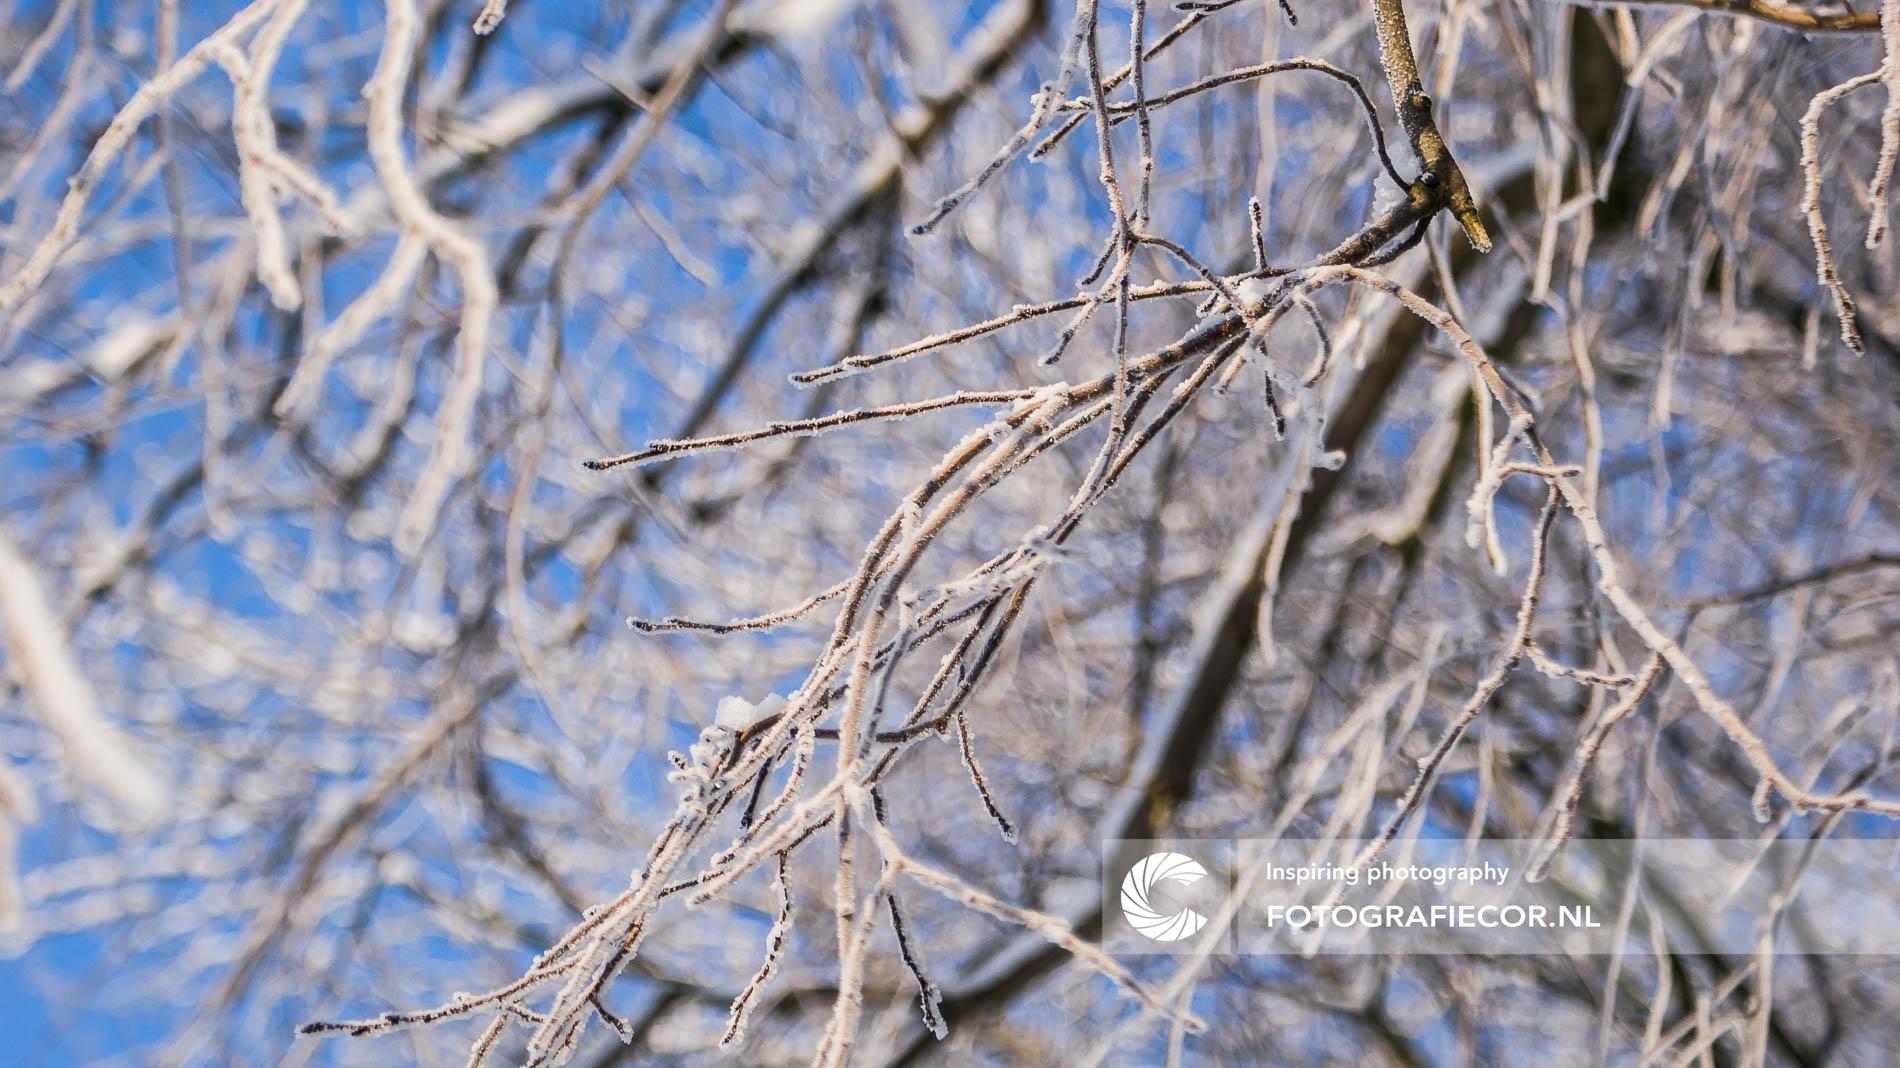 Winterse achtergrond boomtakken | tegen blauwe lucht | Landschapsfotograaf